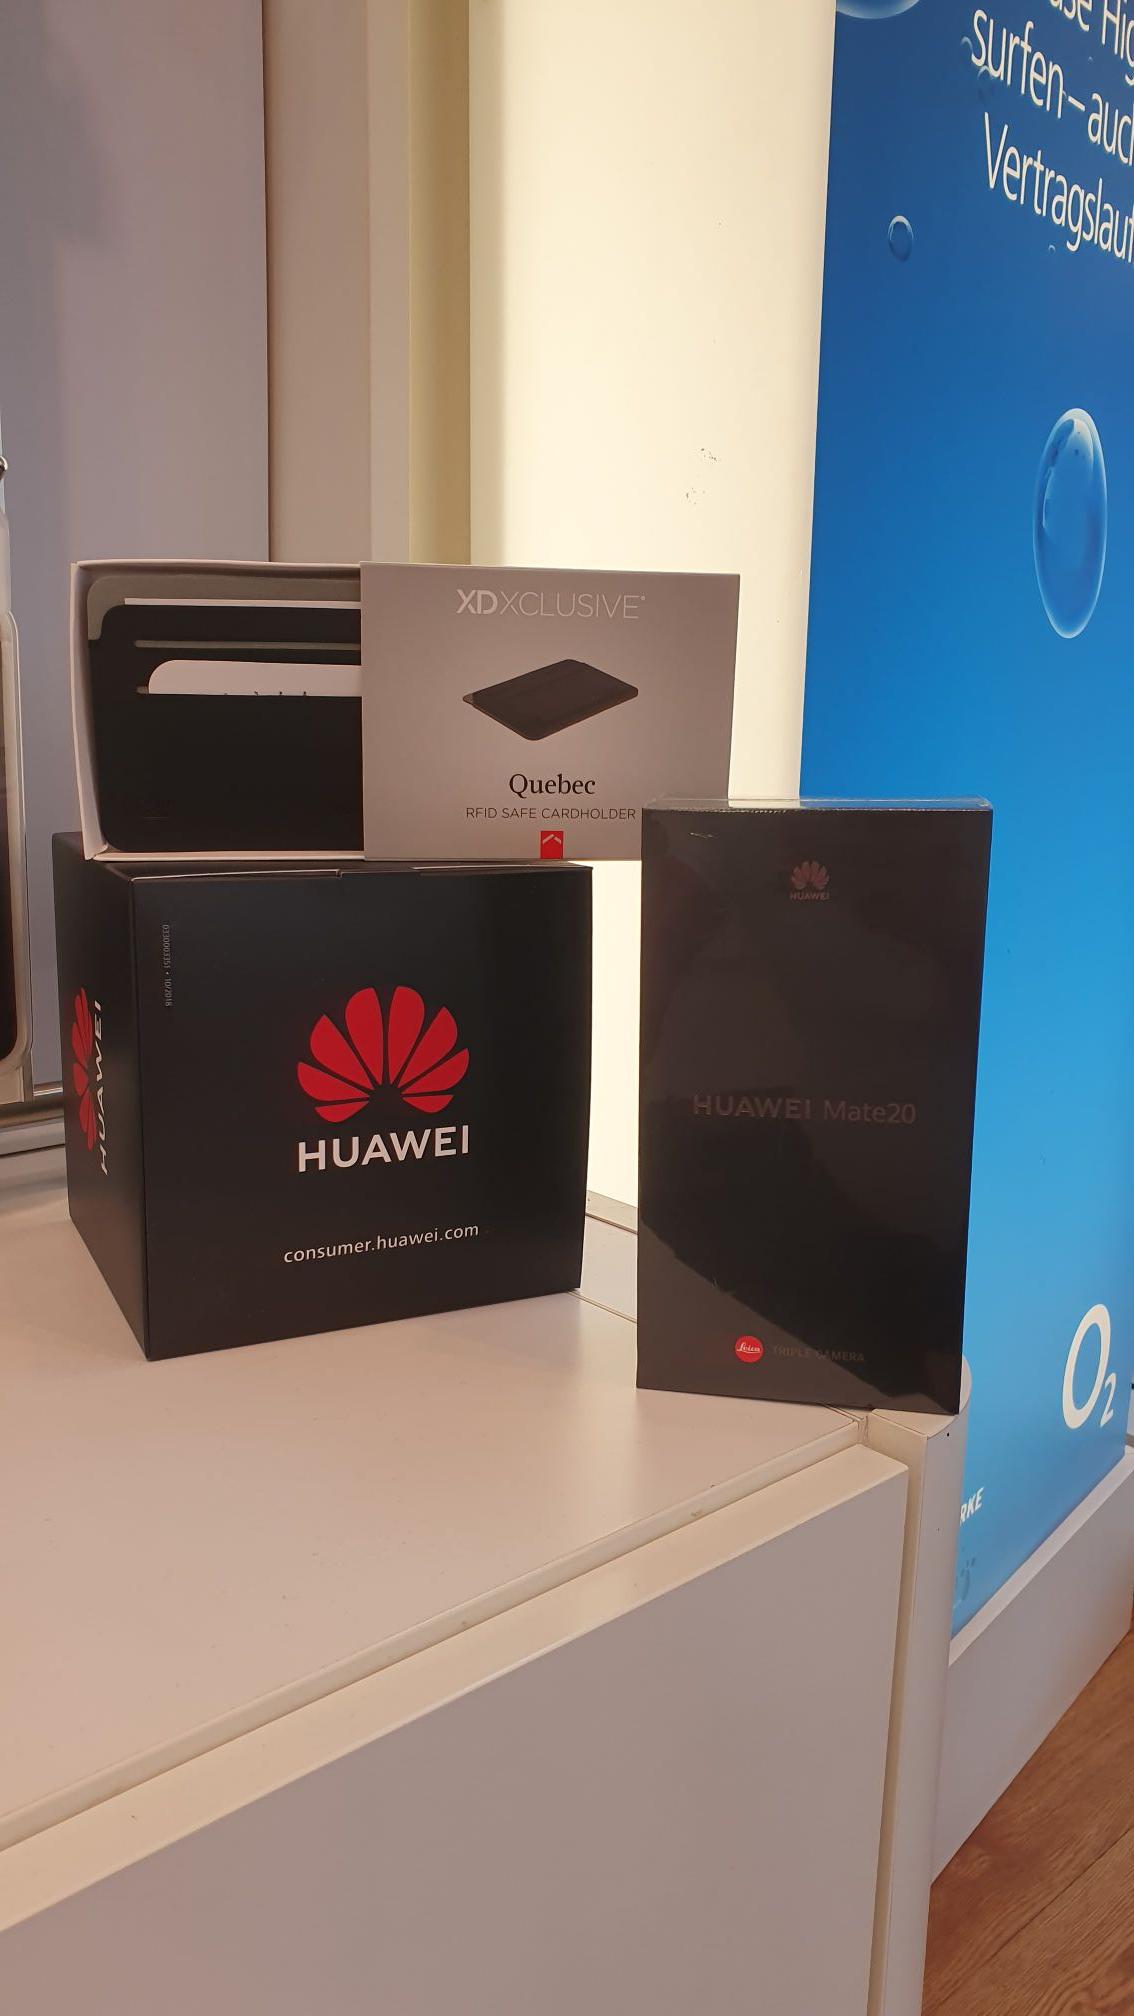 Huawei Mate 20 mit RFID Cardholder Werre Park Bad Oyenhausen